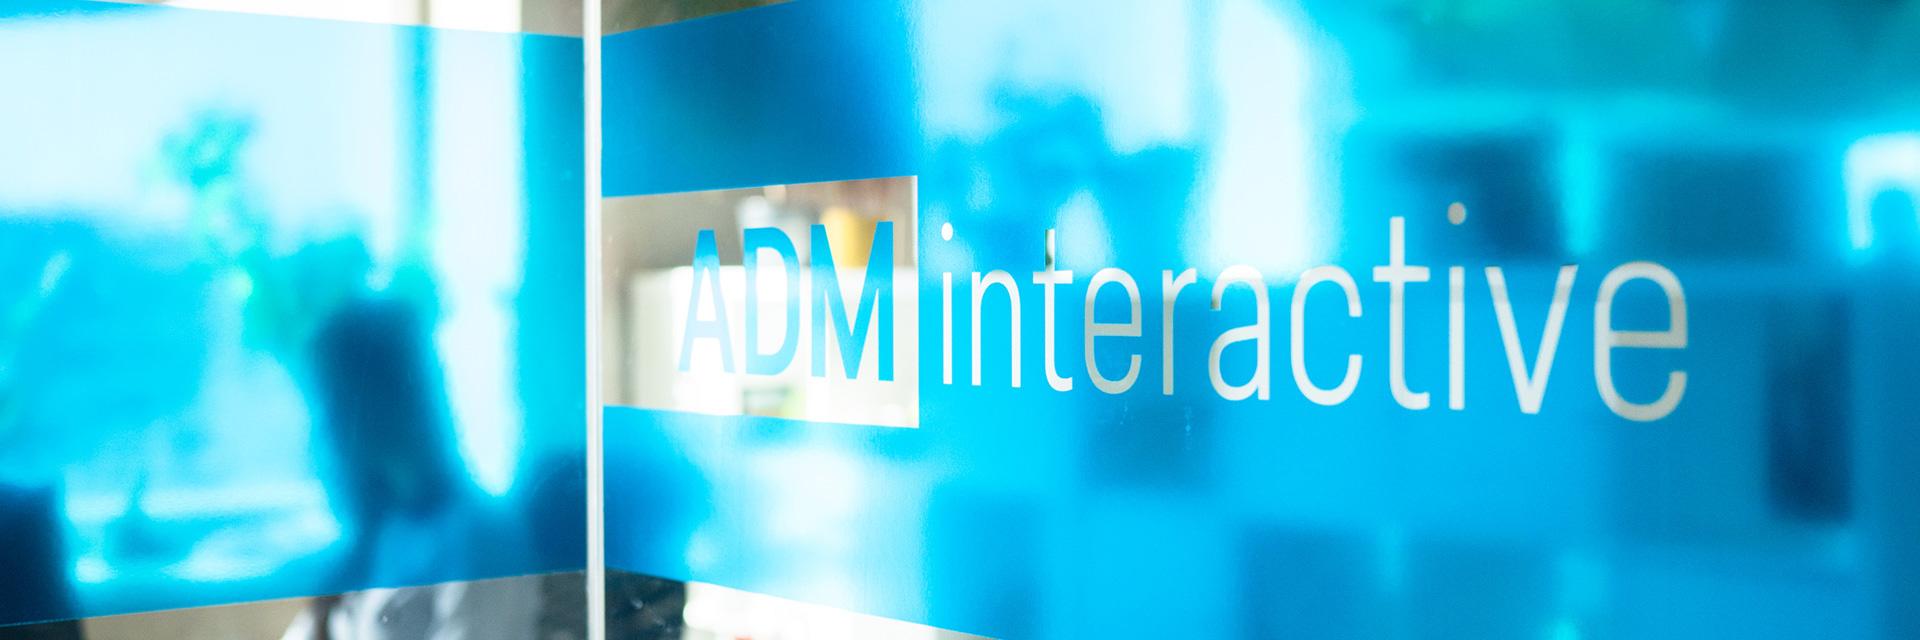 adm_interactive